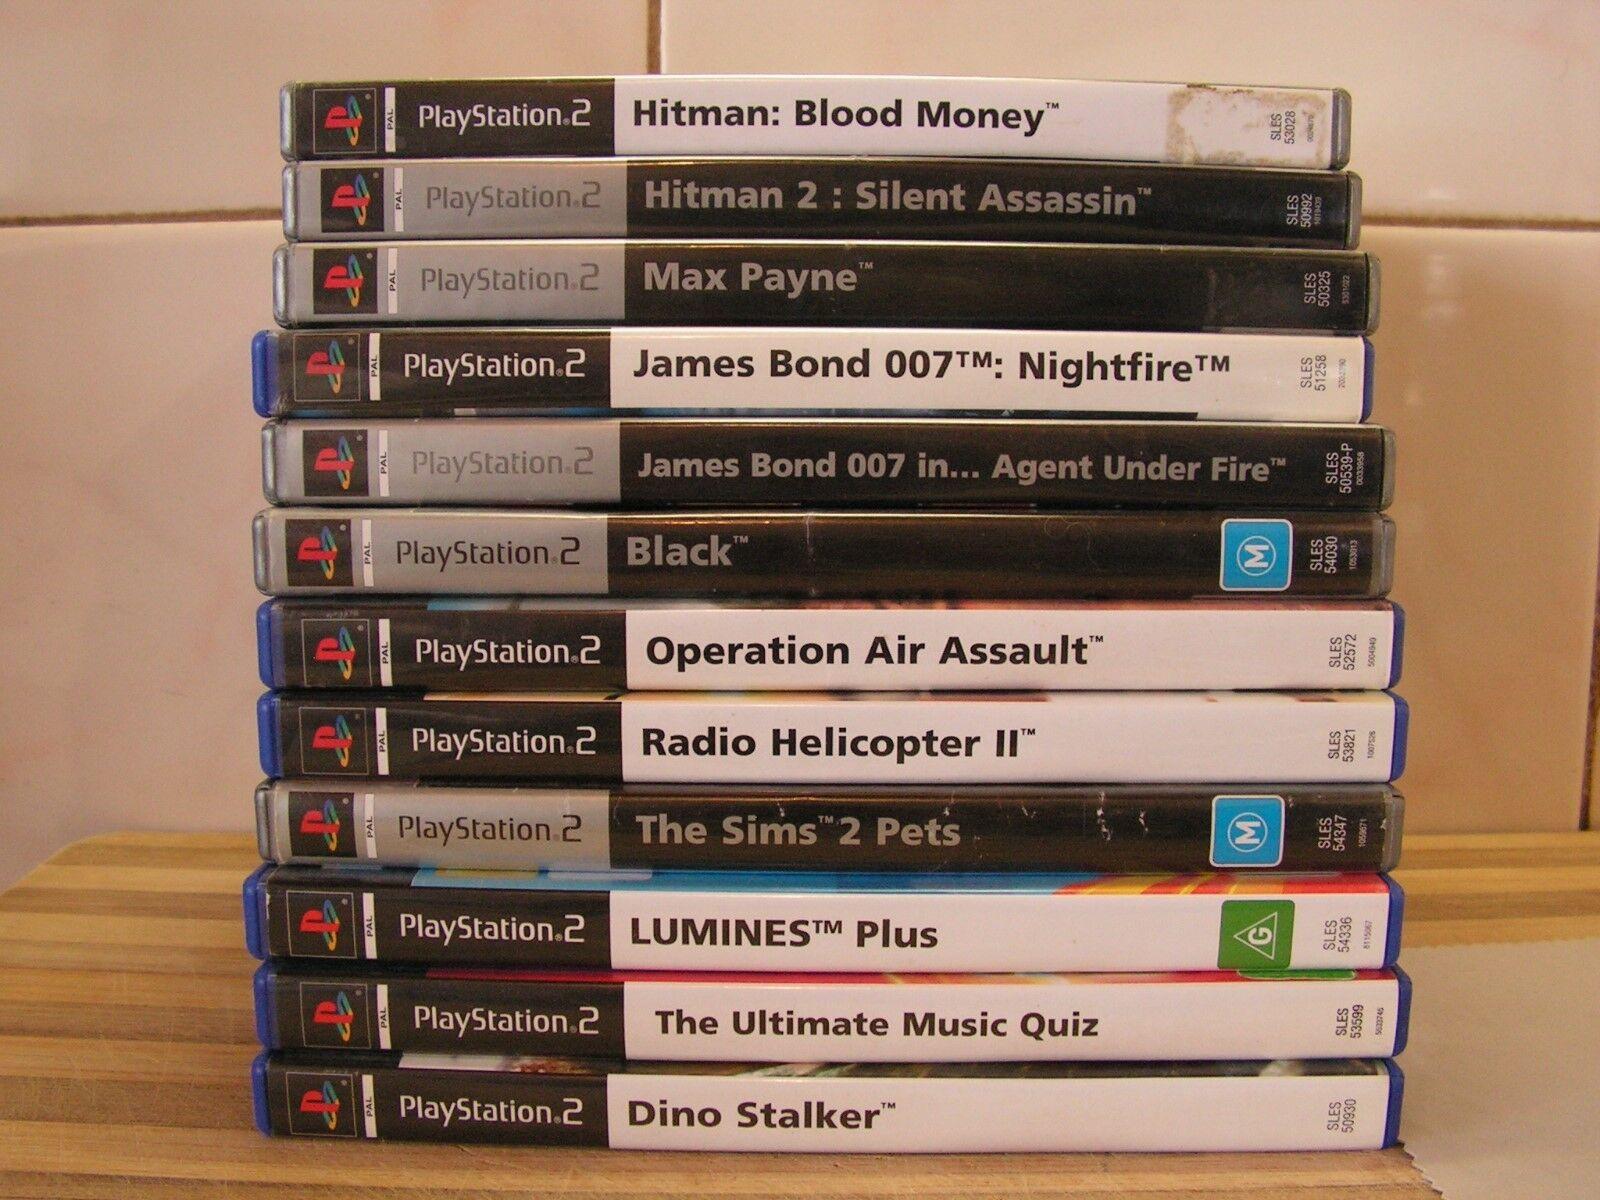 Juegos PS2 Hitman, James Bond 007, Sims, Max Payne, Negro, etc. Escoge 1 GC